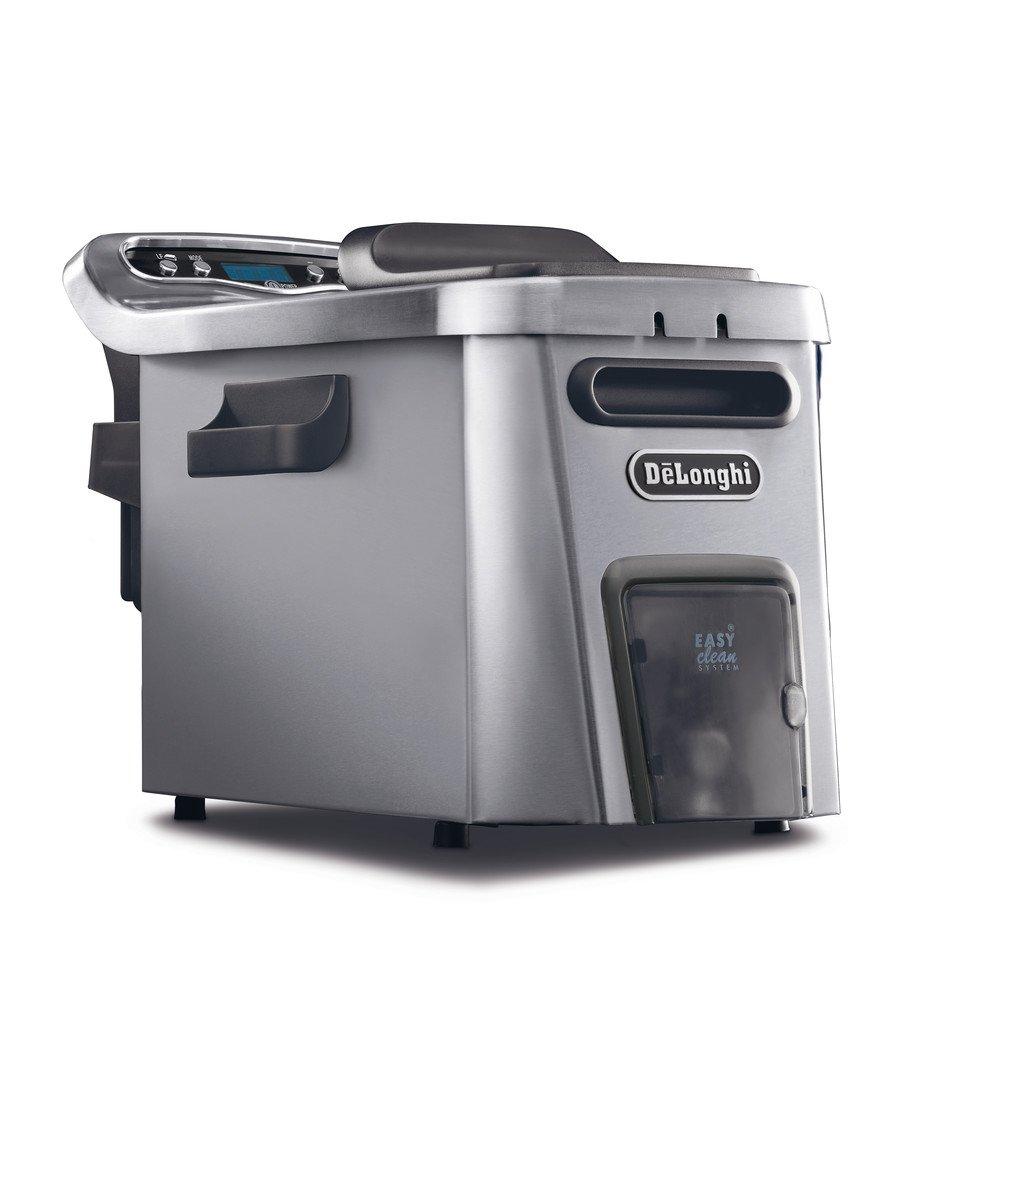 DeLonghi D44528DZ Livenza Easy Clean Deep Fryer, Silver